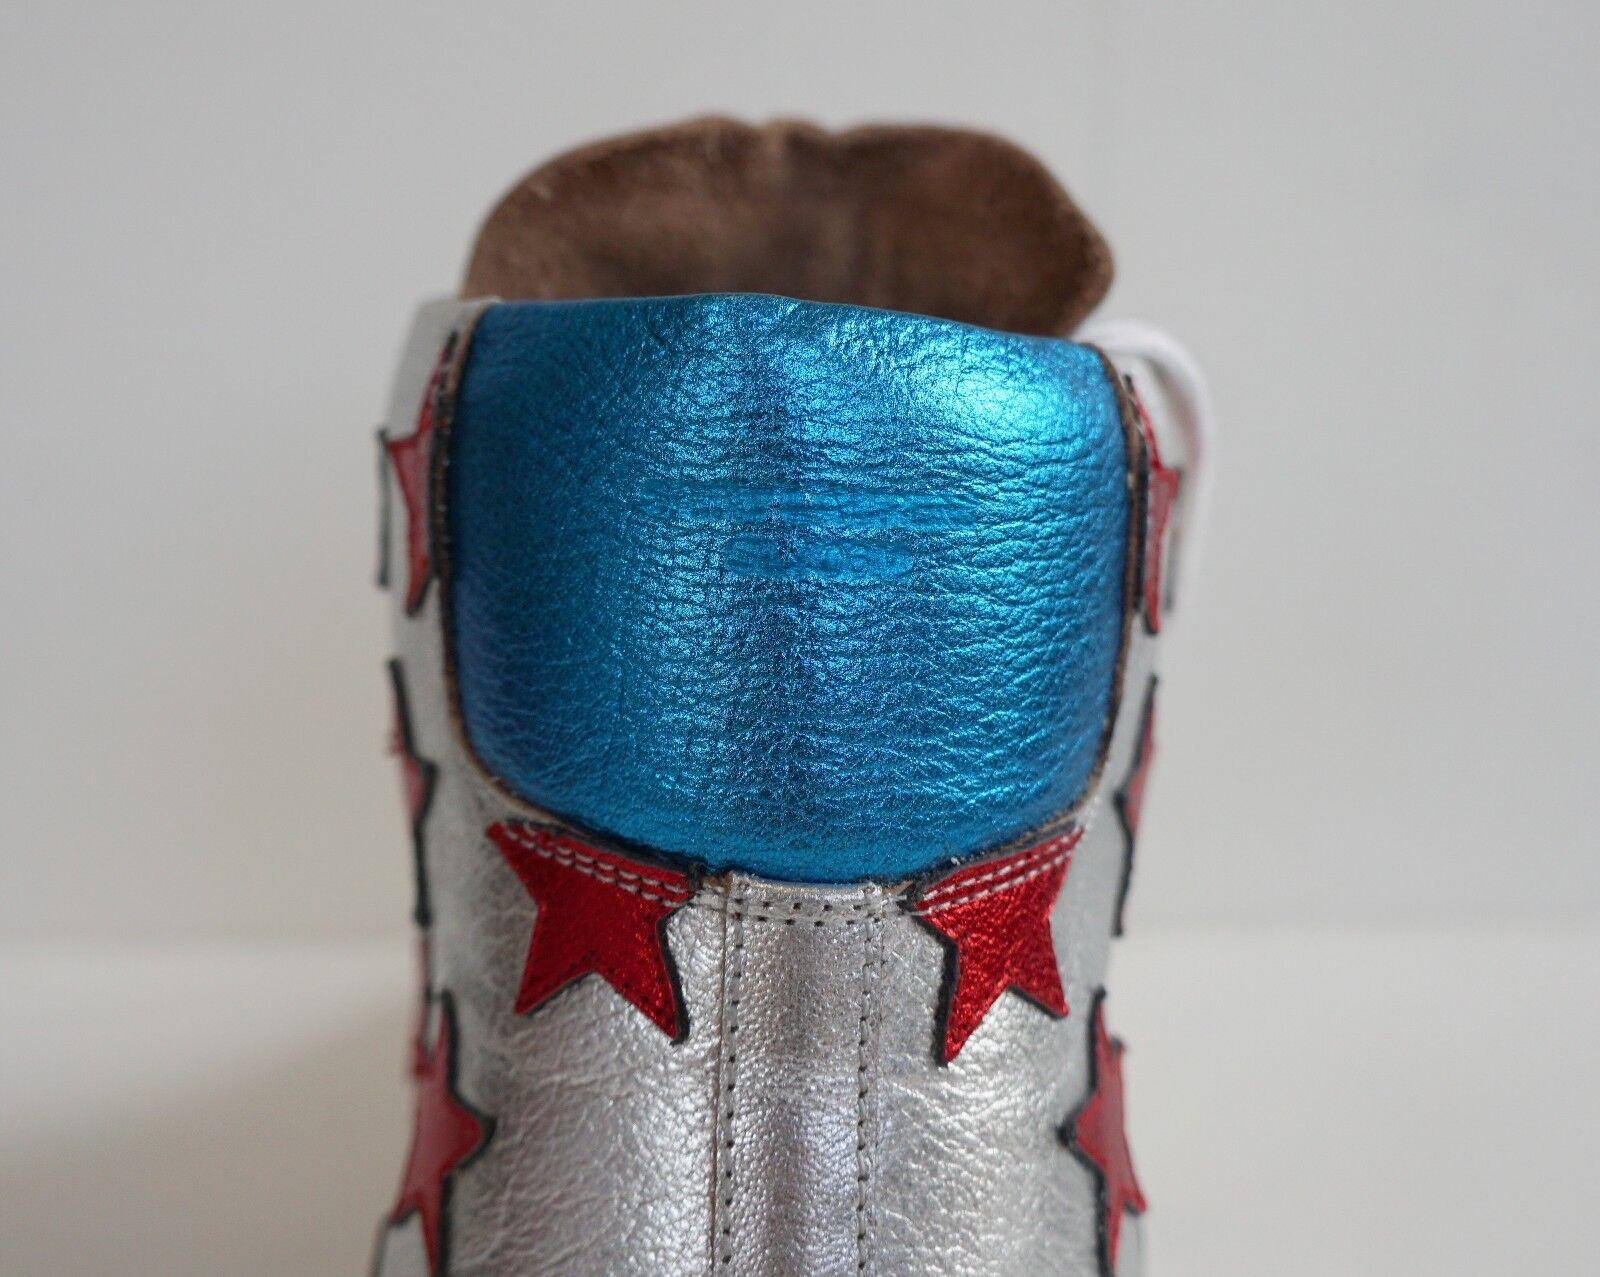 Scarpe casual da uomo  SAINT LAURENT SL/06 STAR CALIFORNIA COURT CLASSIC Leather Sneakers EU-43 US-10